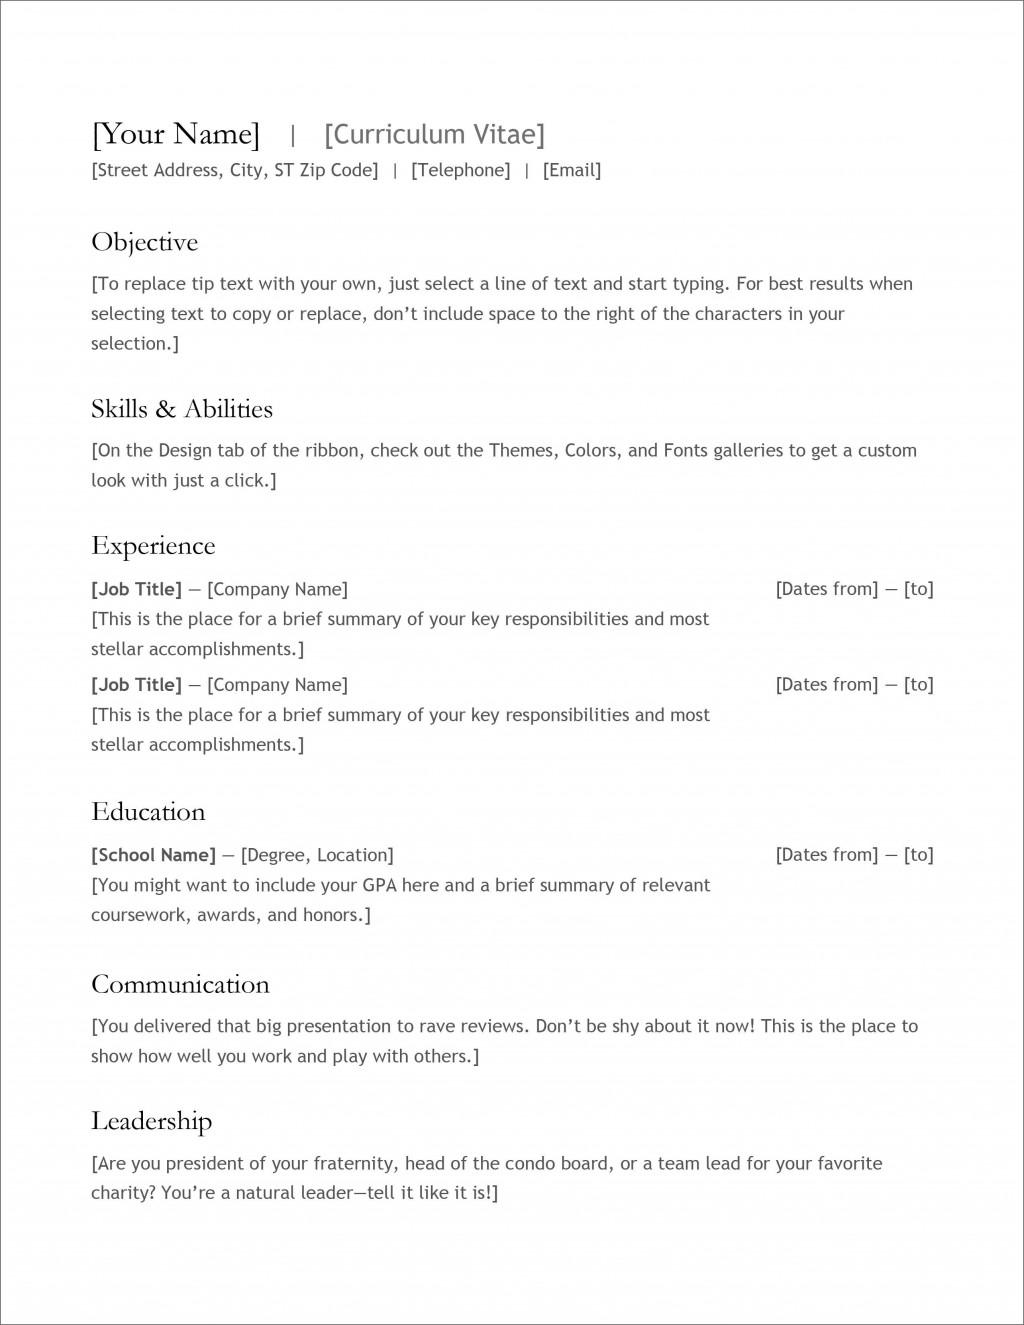 007 Fascinating Free Professional Resume Template Microsoft Word Inspiration  Cv 2010Large